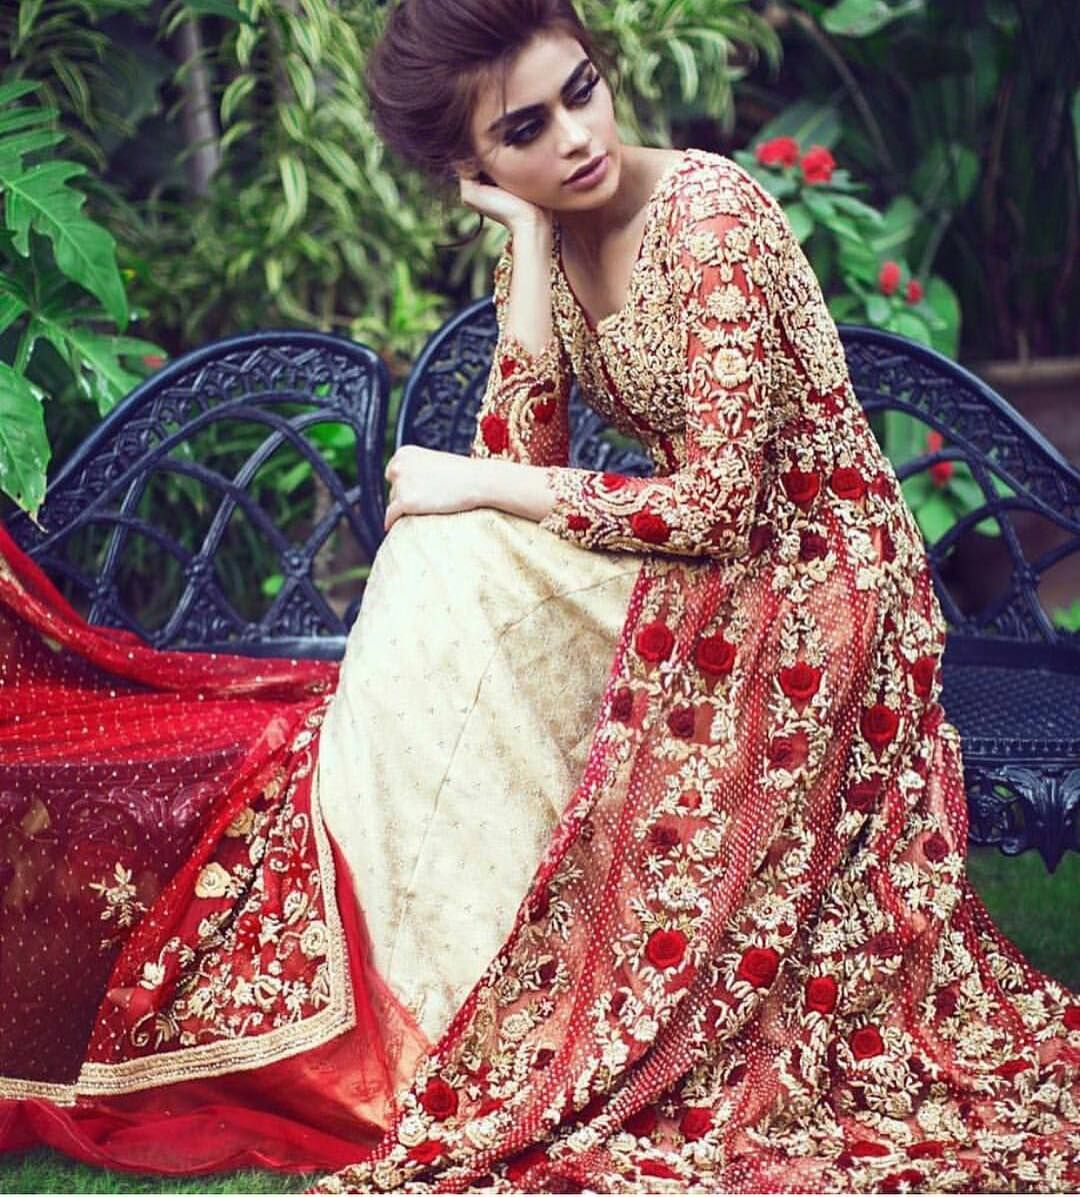 Red dress instagram dm